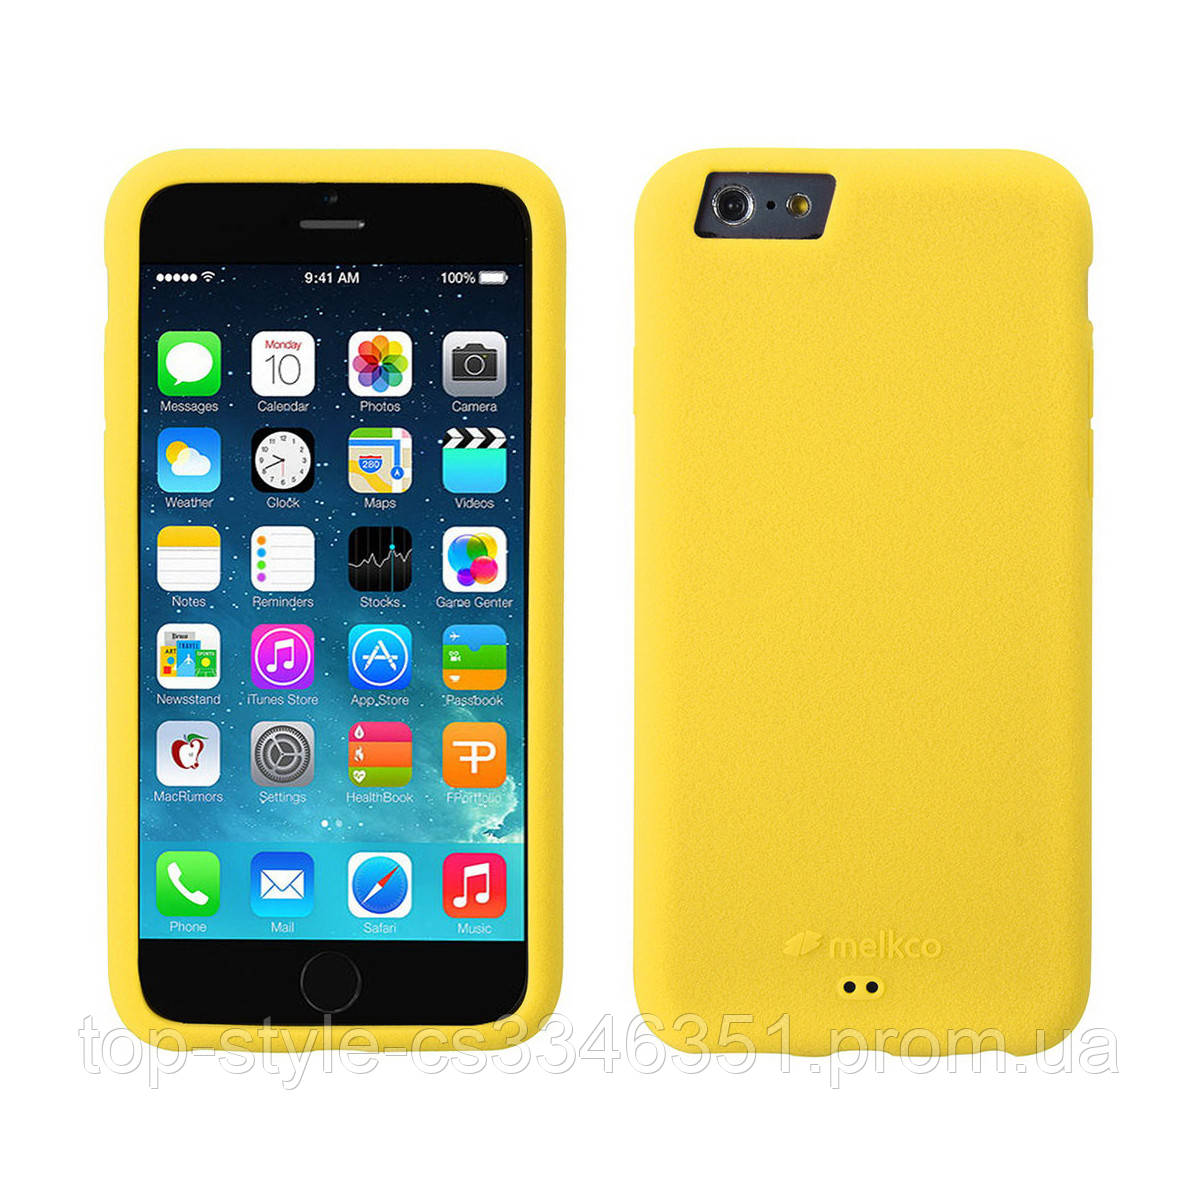 Чехол-накладка Melkco Silikonovy Case для iPhone 6/6s Yellow